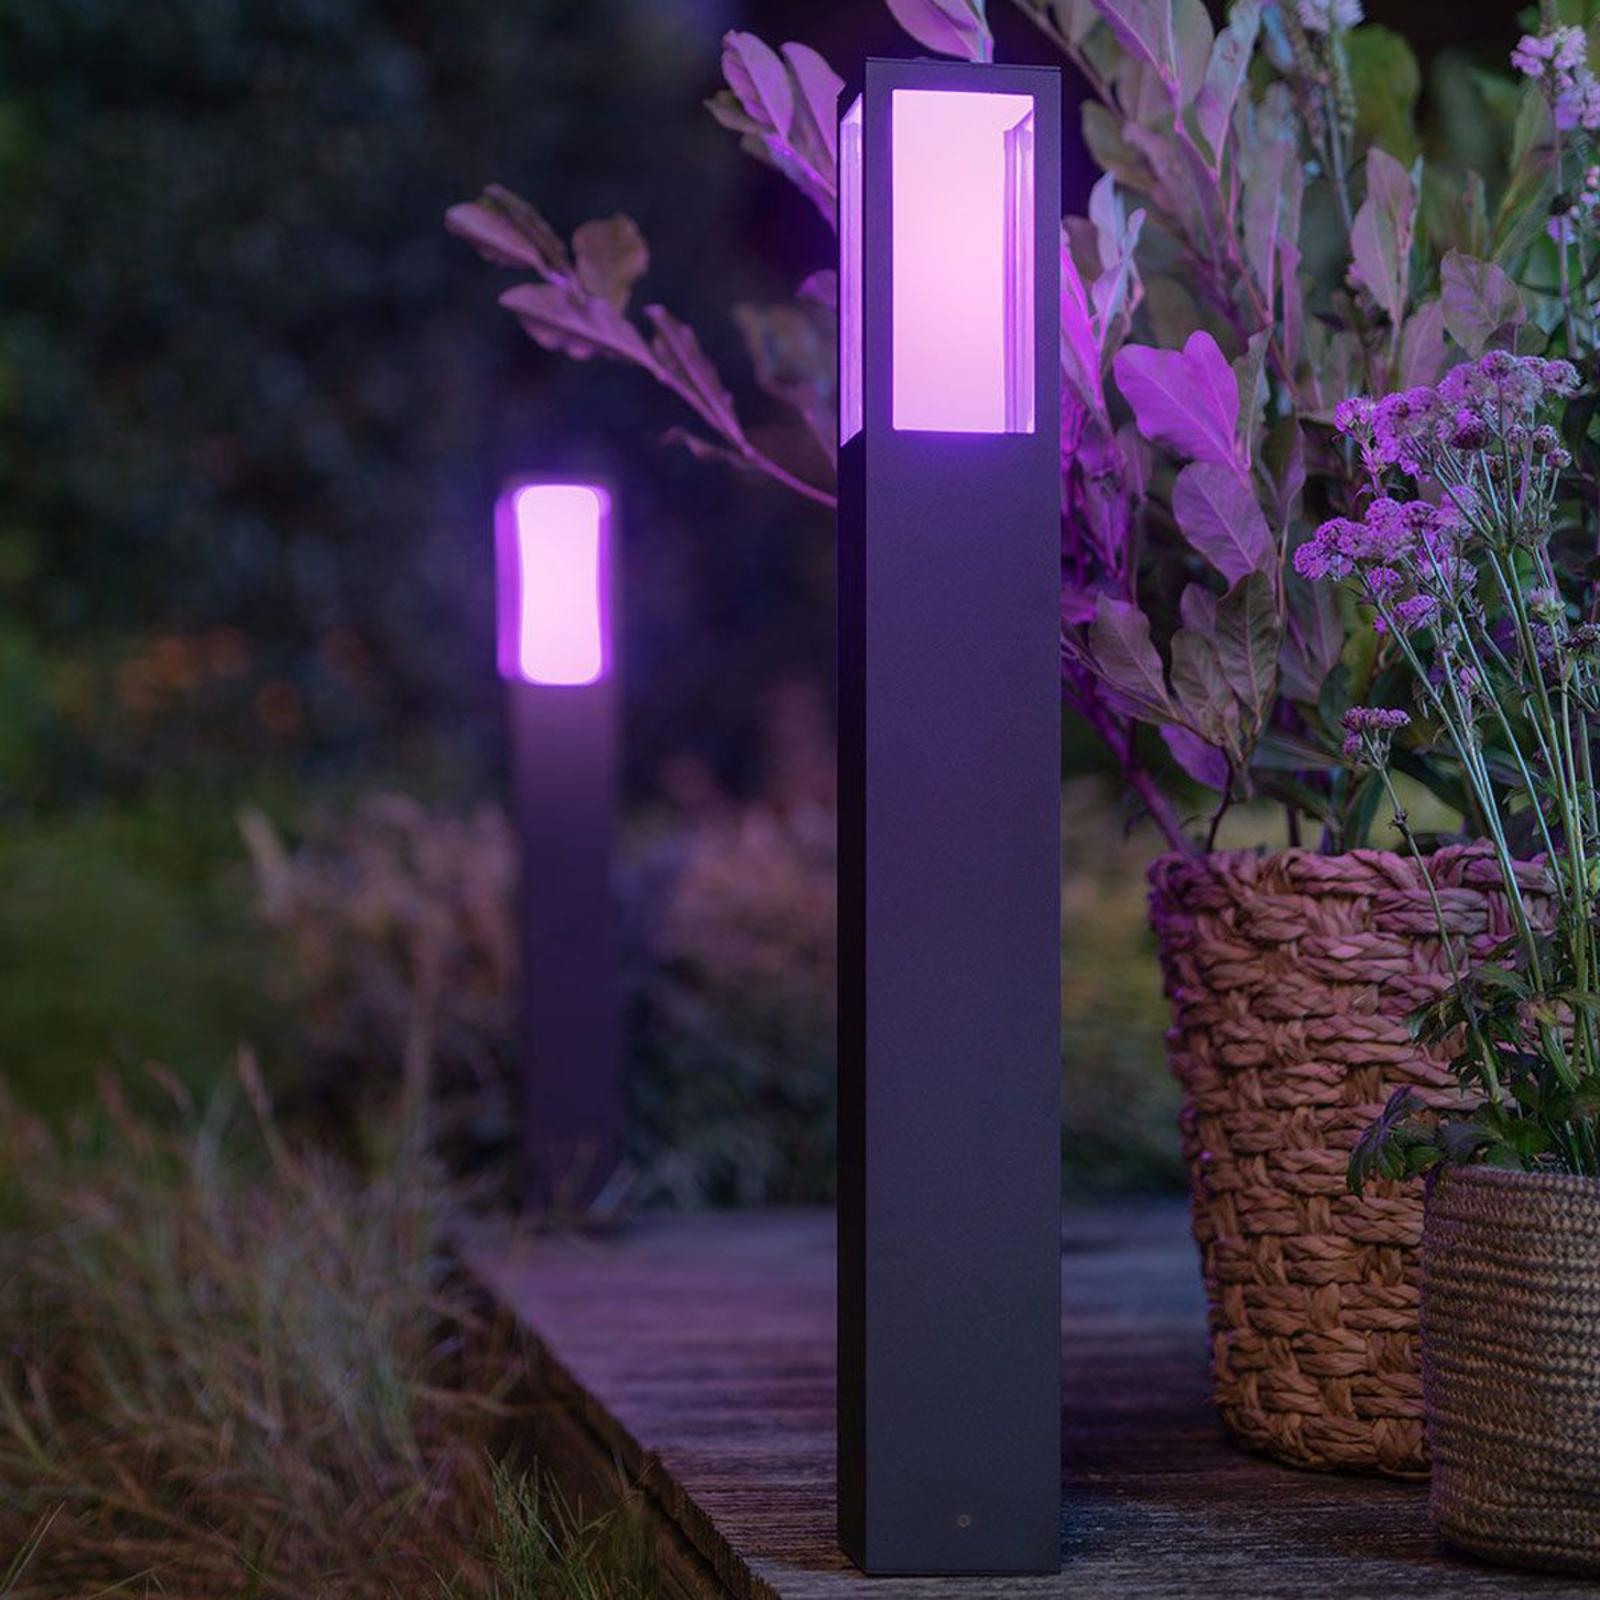 Philips Hue White+Color Impress LED-väglampa